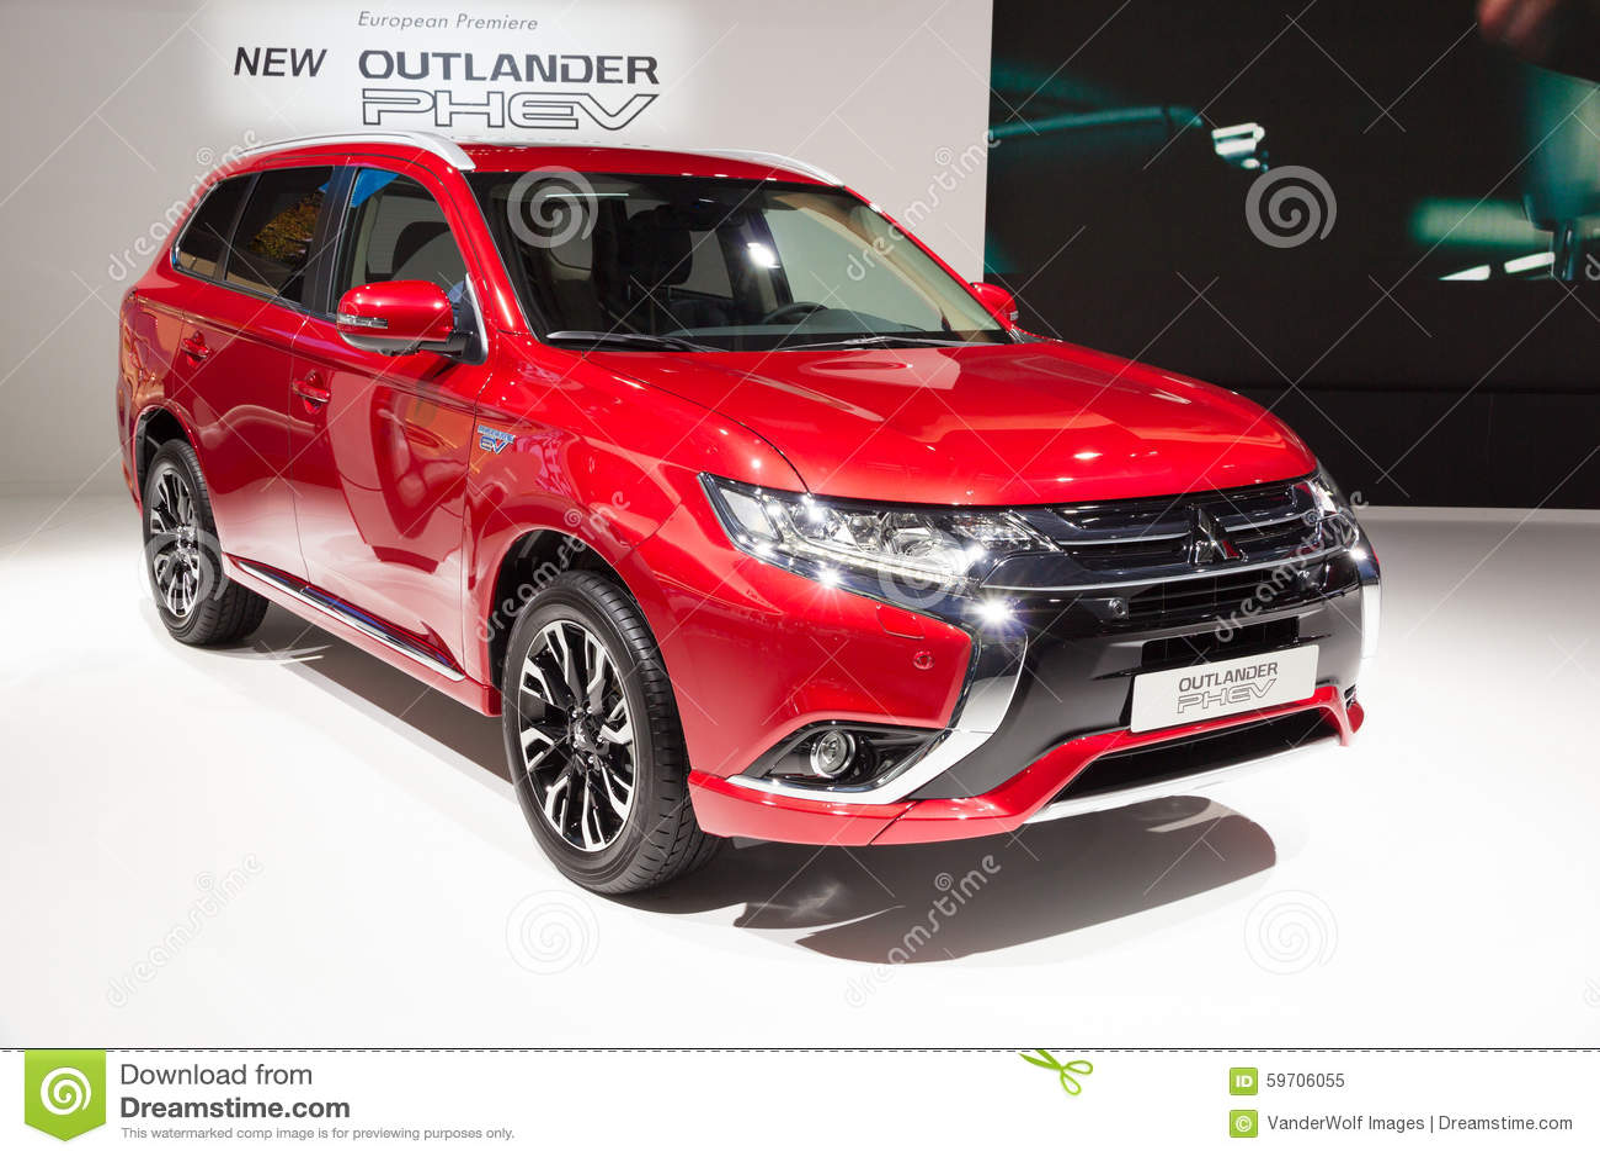 2016 Mitsubishi Outlander PHEV Editorial Image - Image of